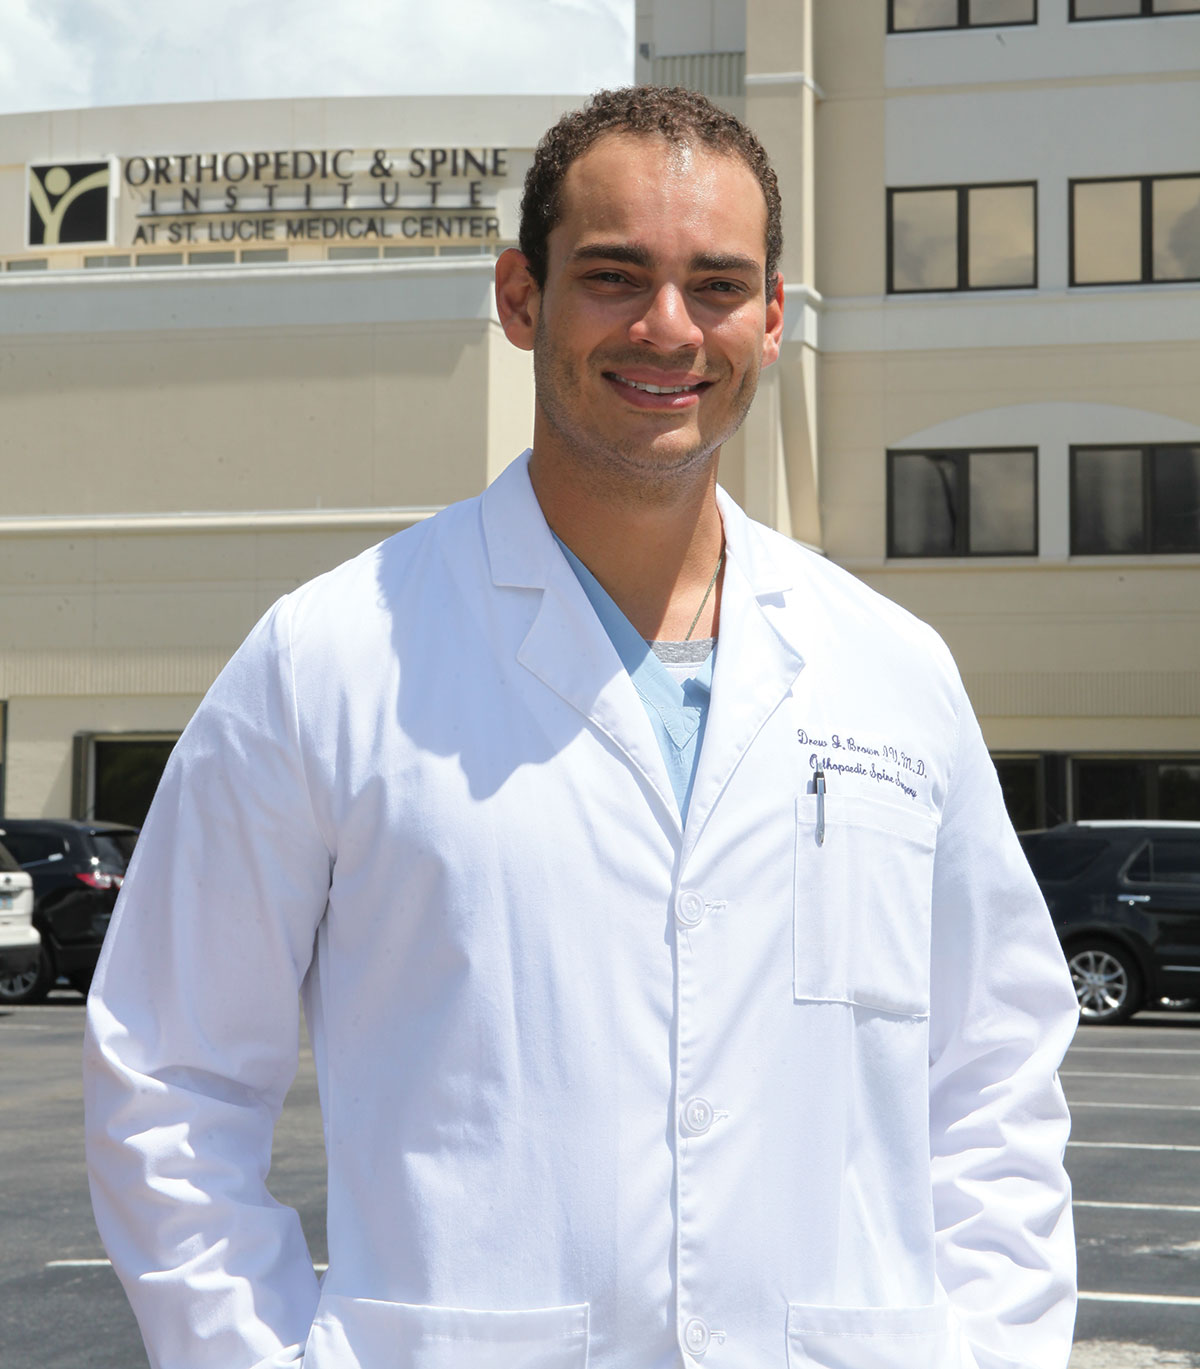 Dr. Drew Brown